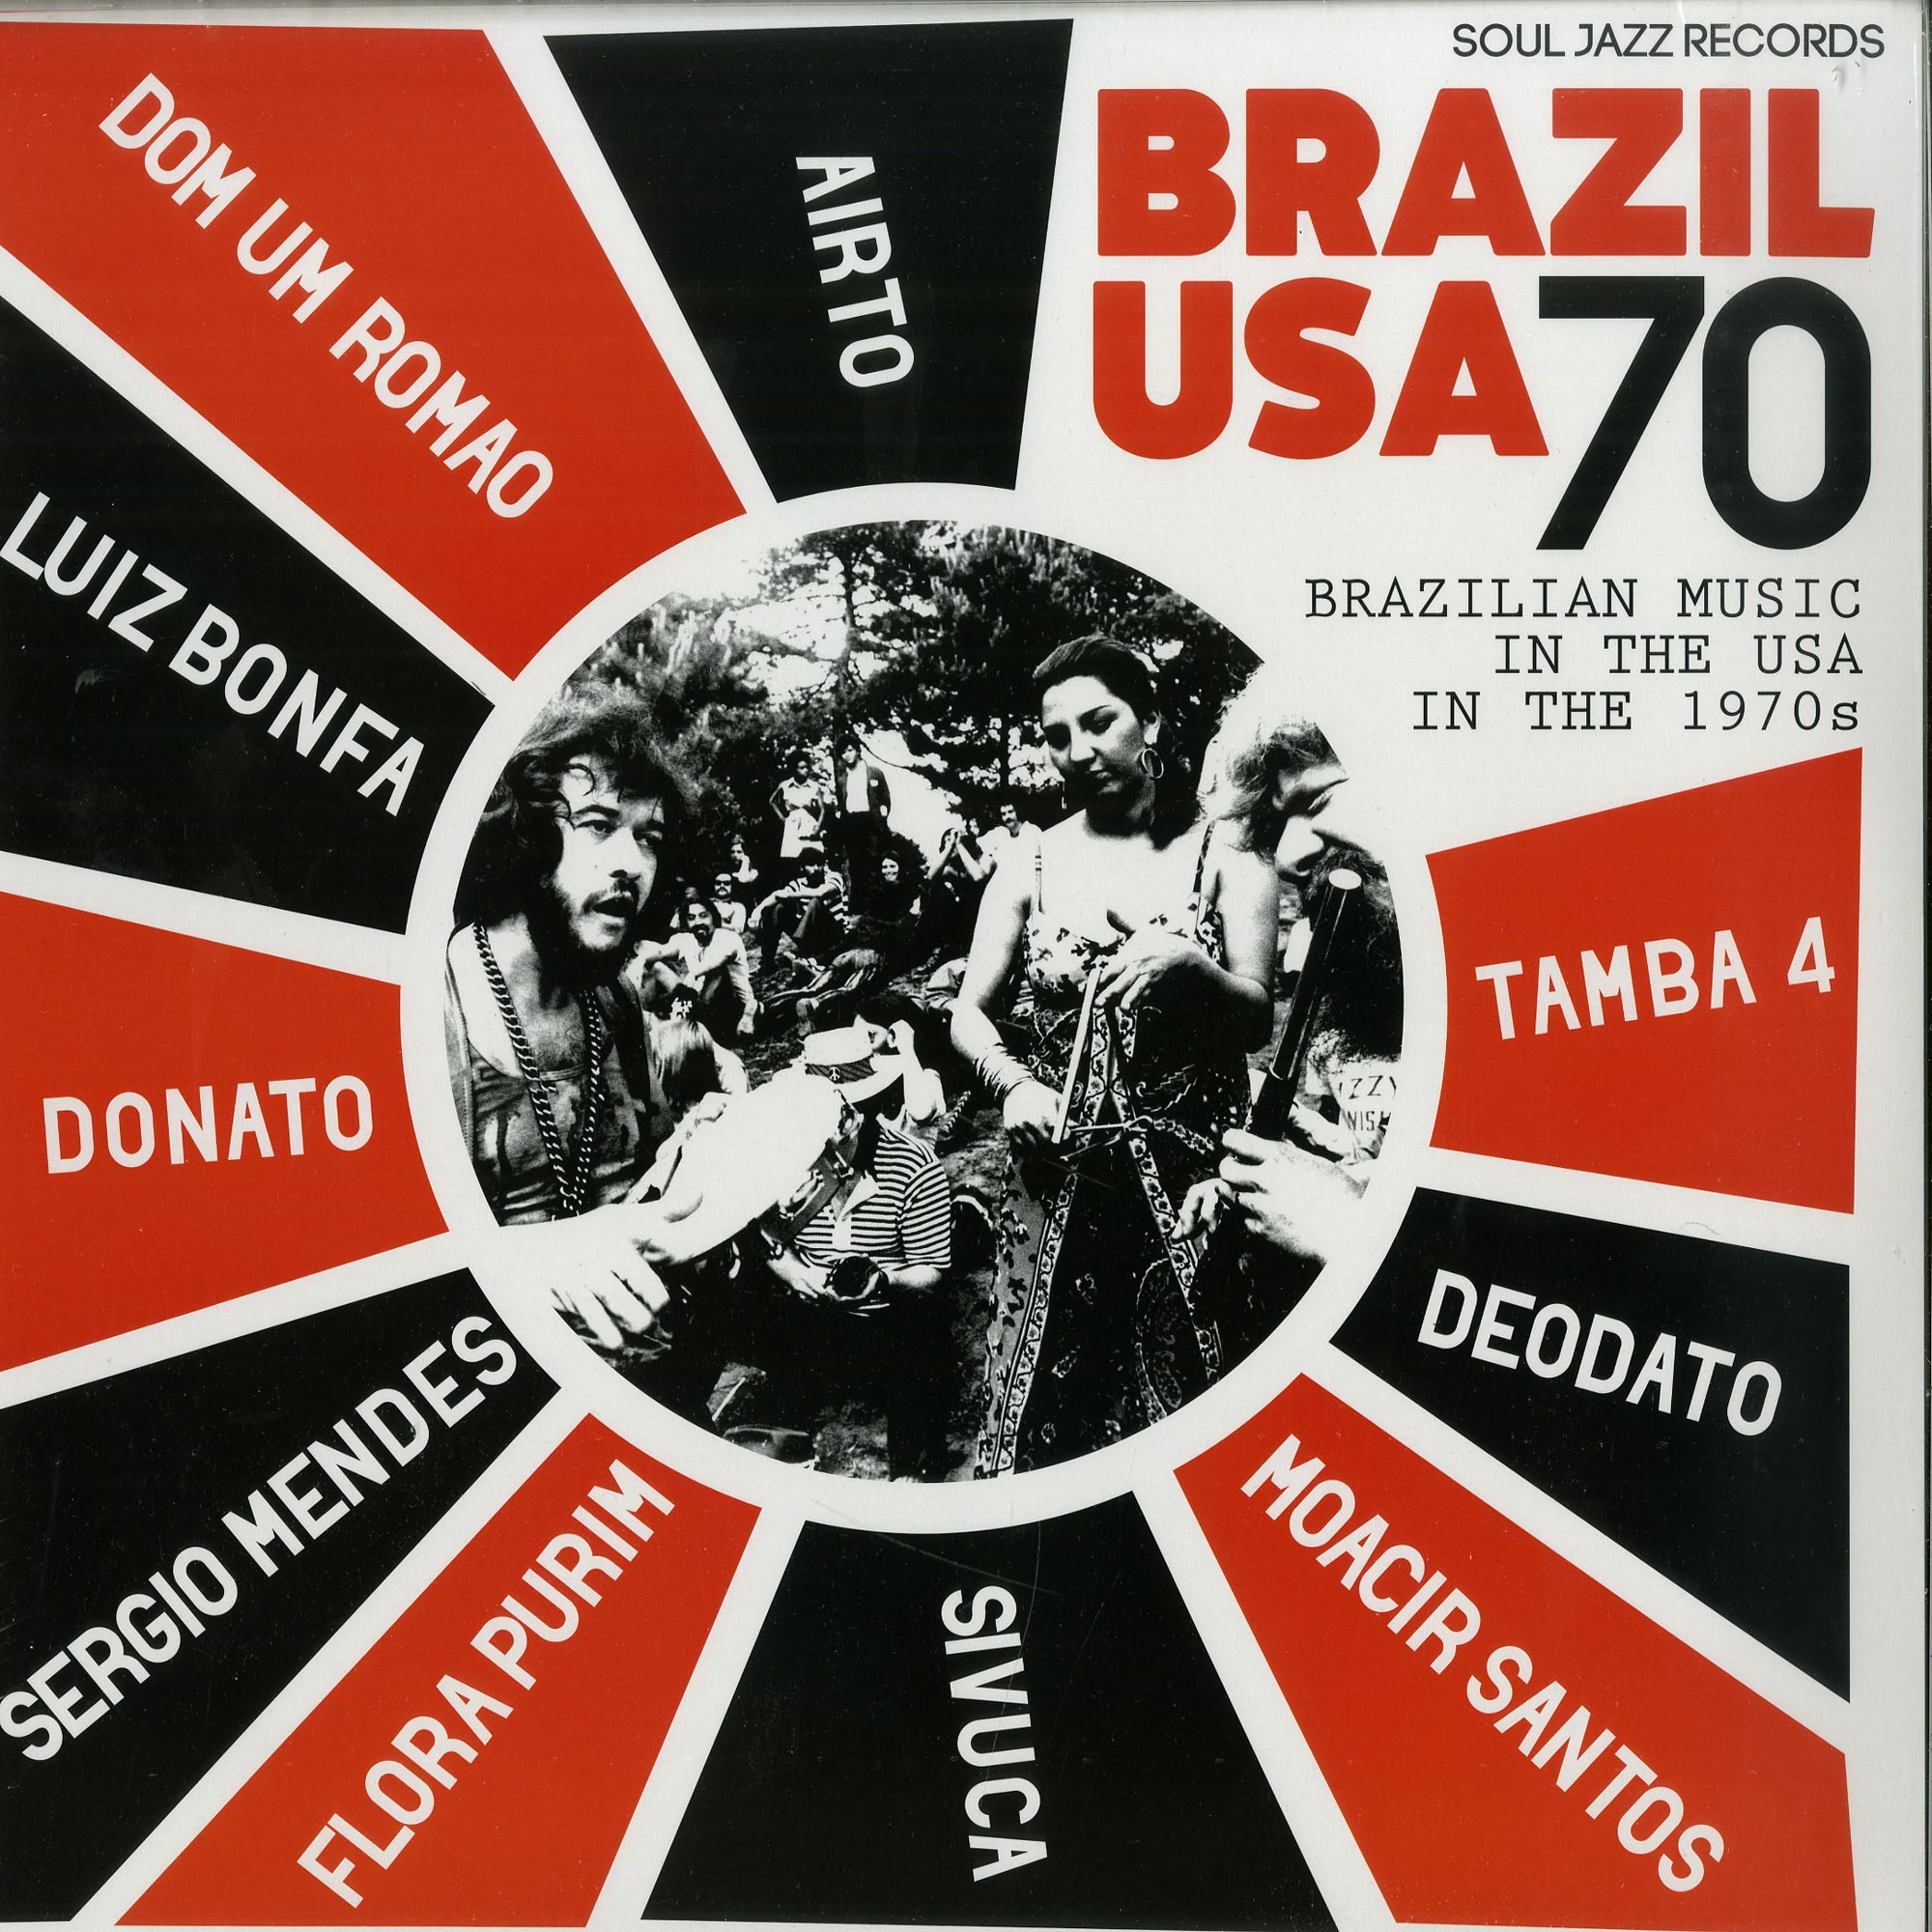 Various Artists - BRAZIL USA 70